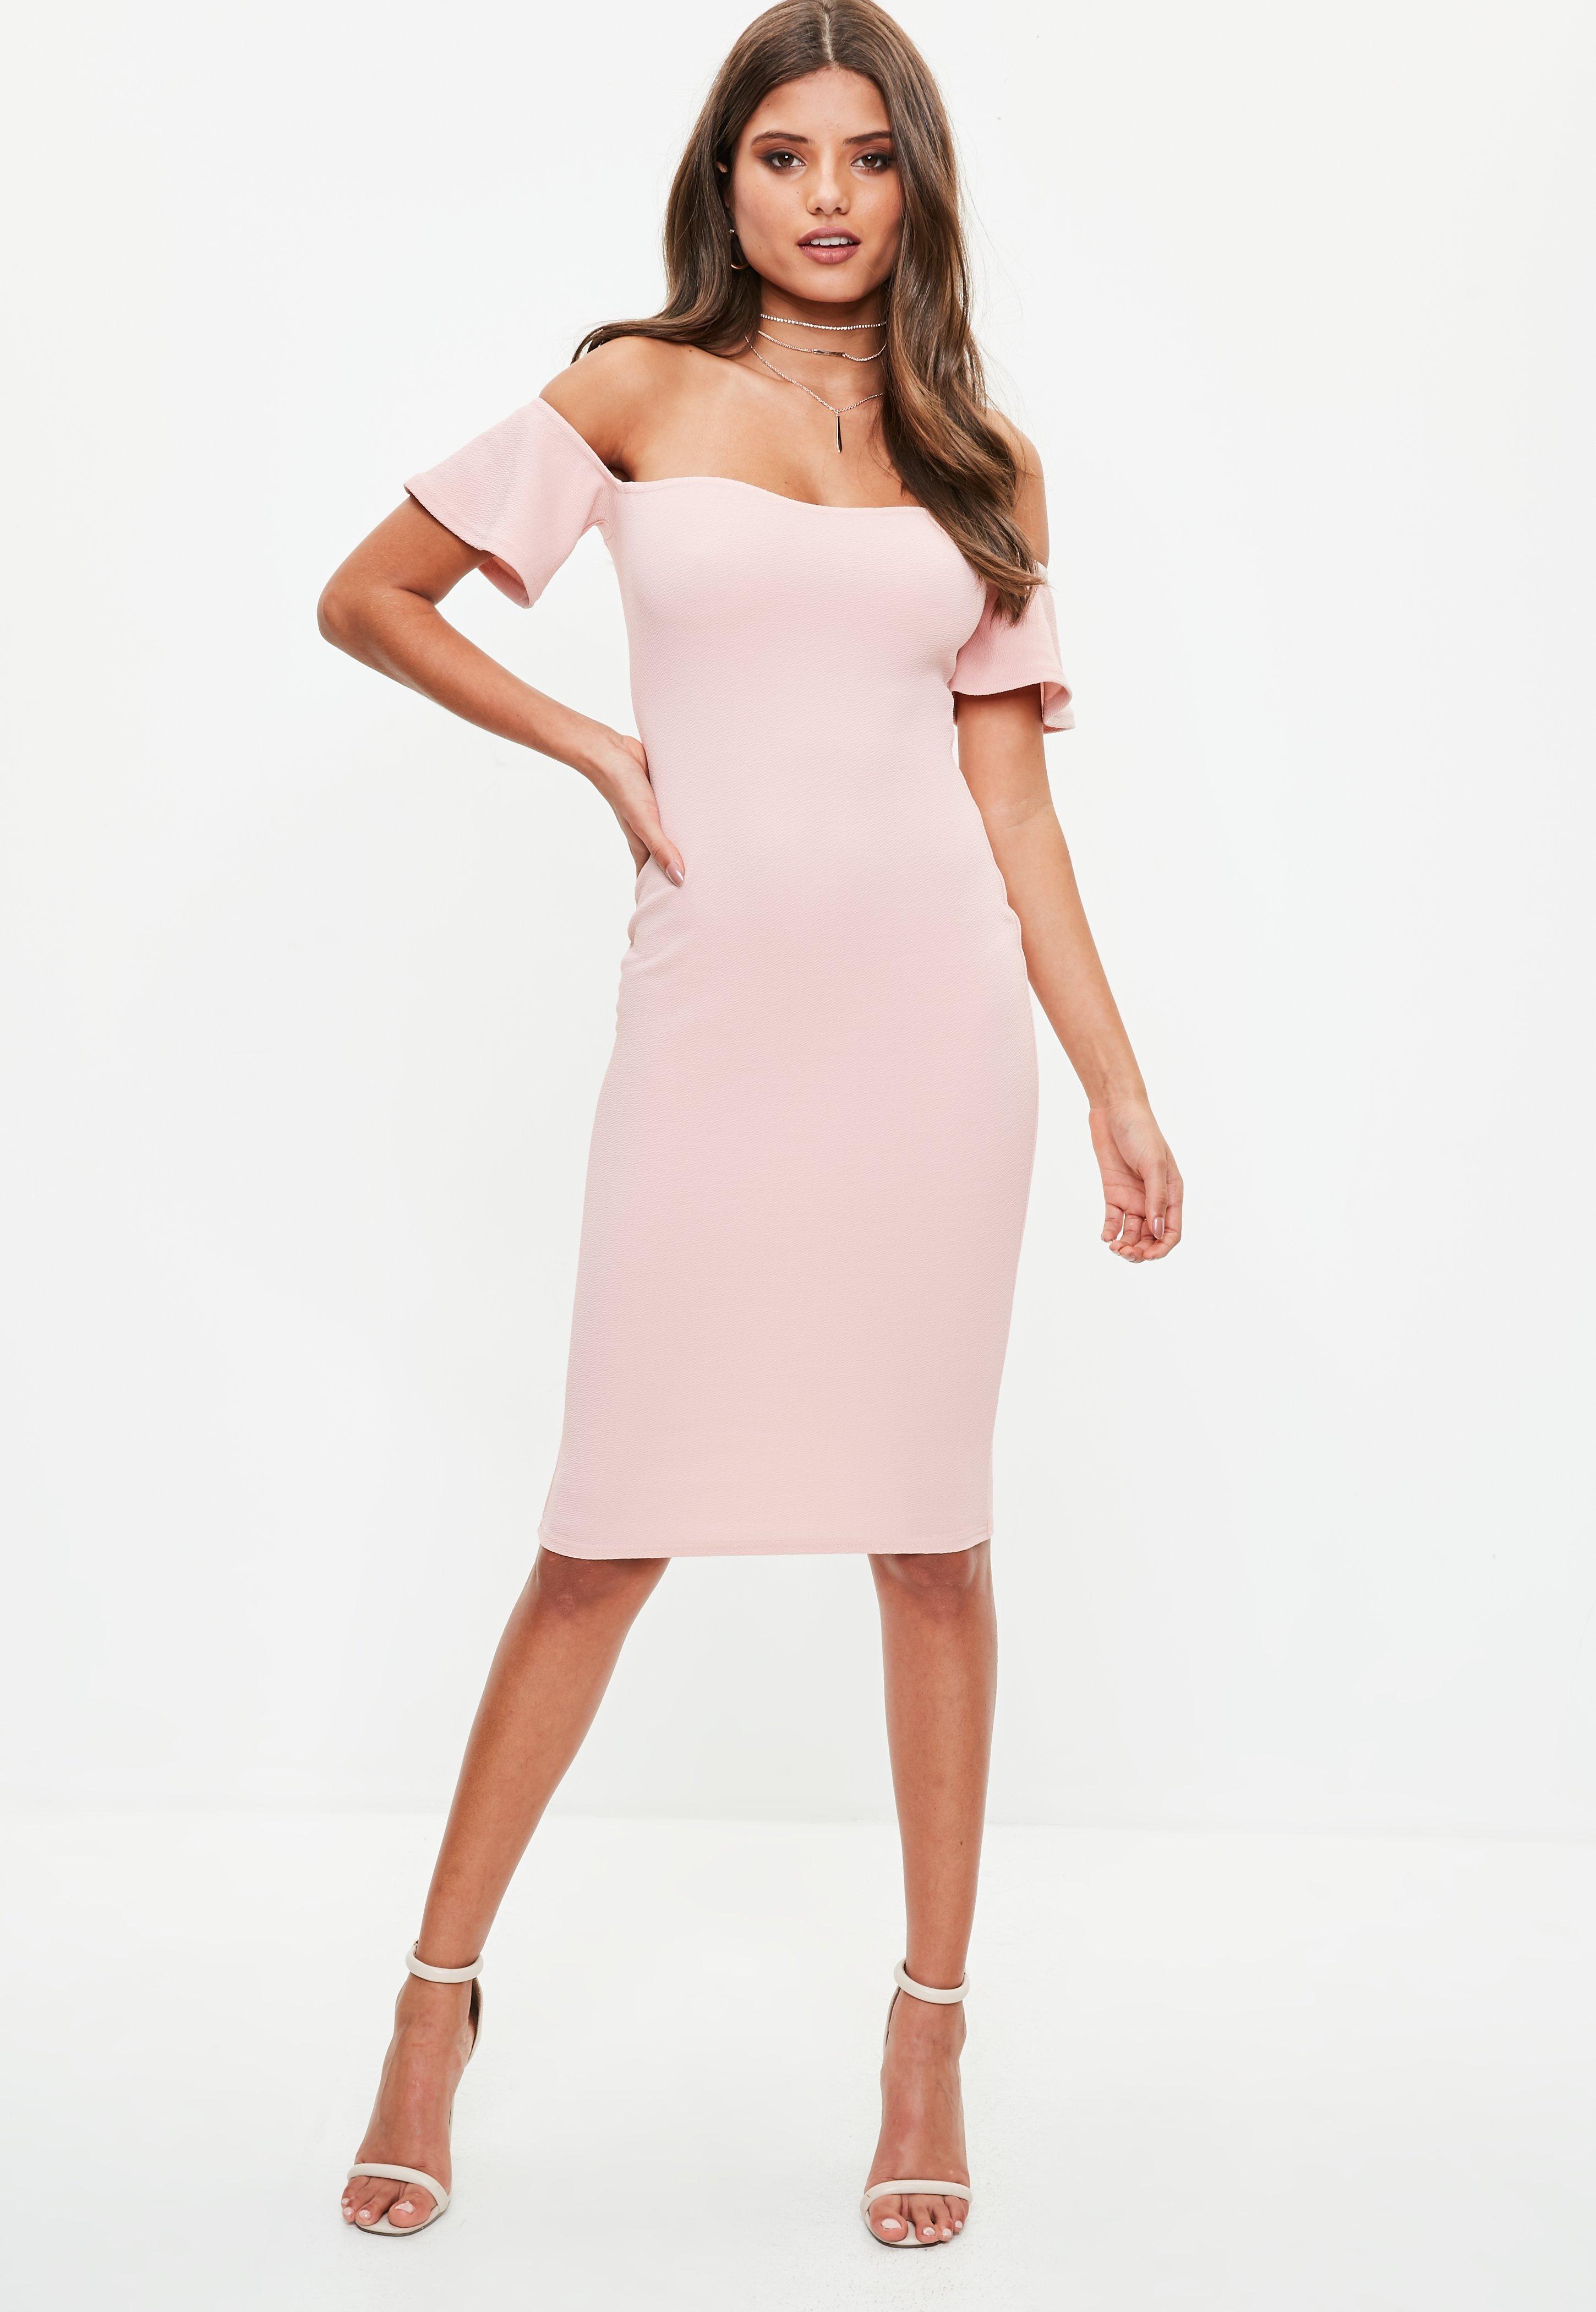 45de94cbfc Missguided Pink Bardot Bodycon Midi Dress in Pink - Lyst